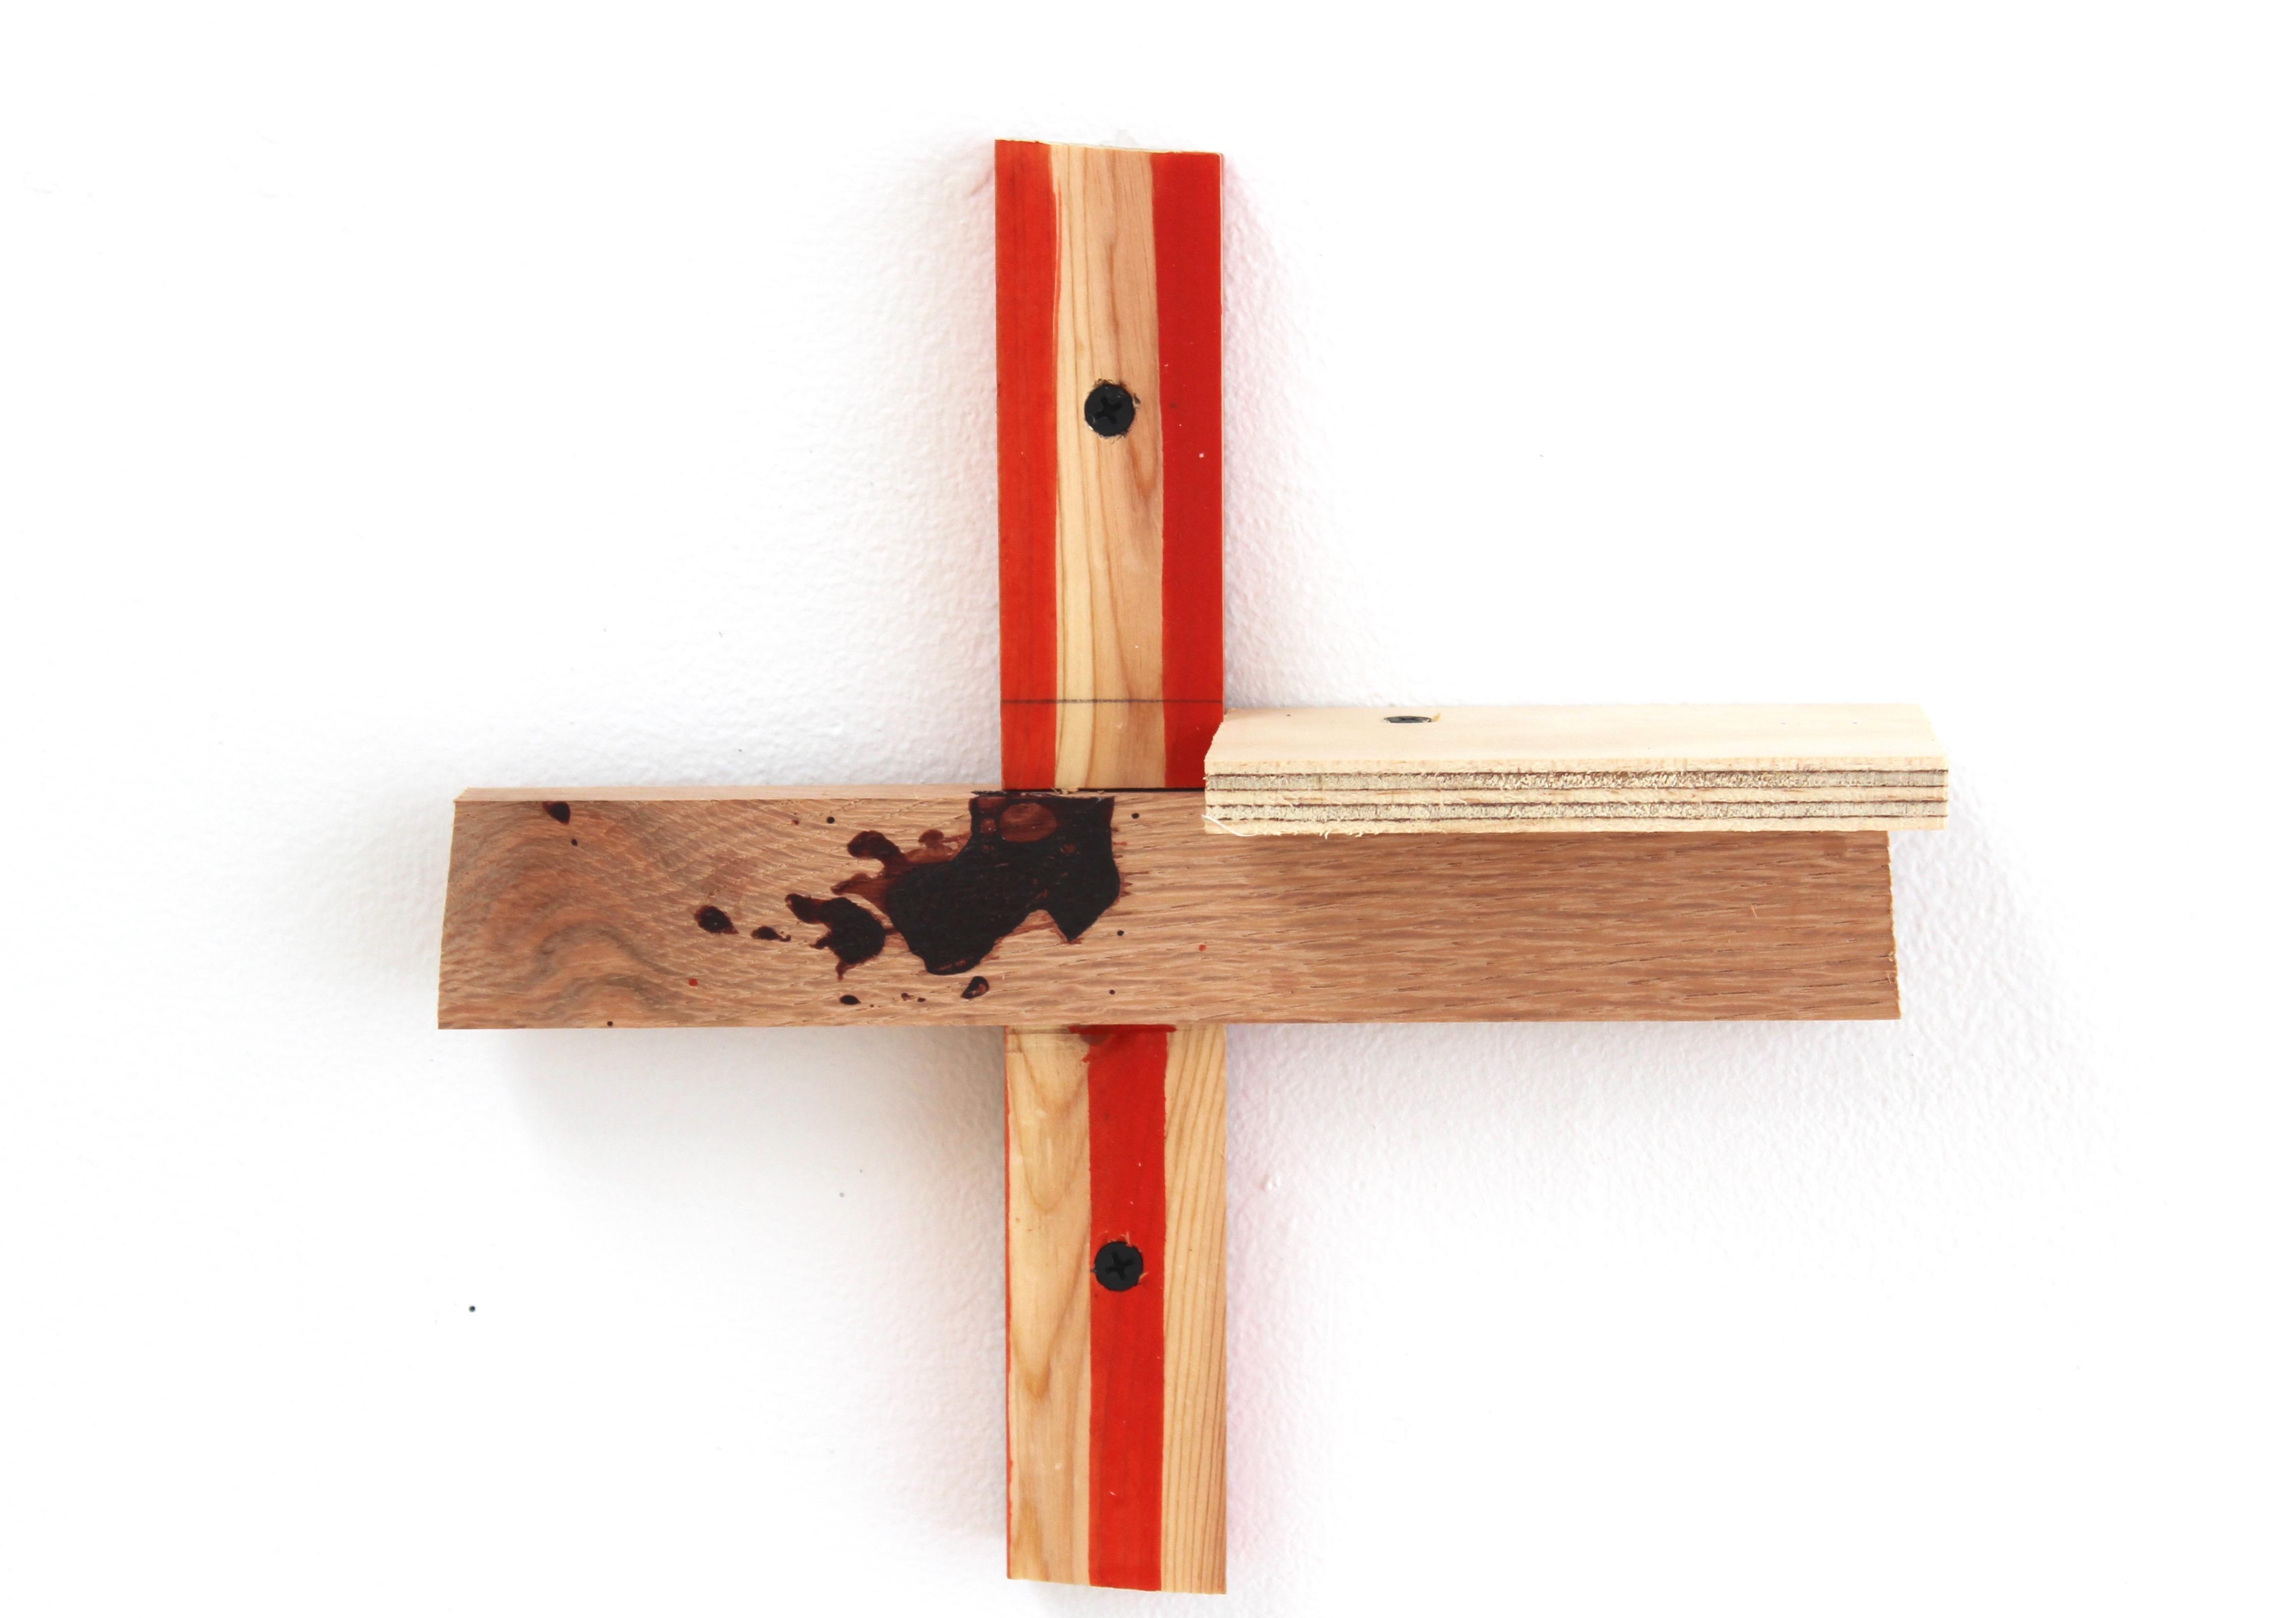 Kevin McNamee-Tweed.<em> Xentri Shelf</em>, 2019. Ink on wood, 10 x 10 1/4 x 2 3/4 inches (25.4 x 26 x 7 cm)